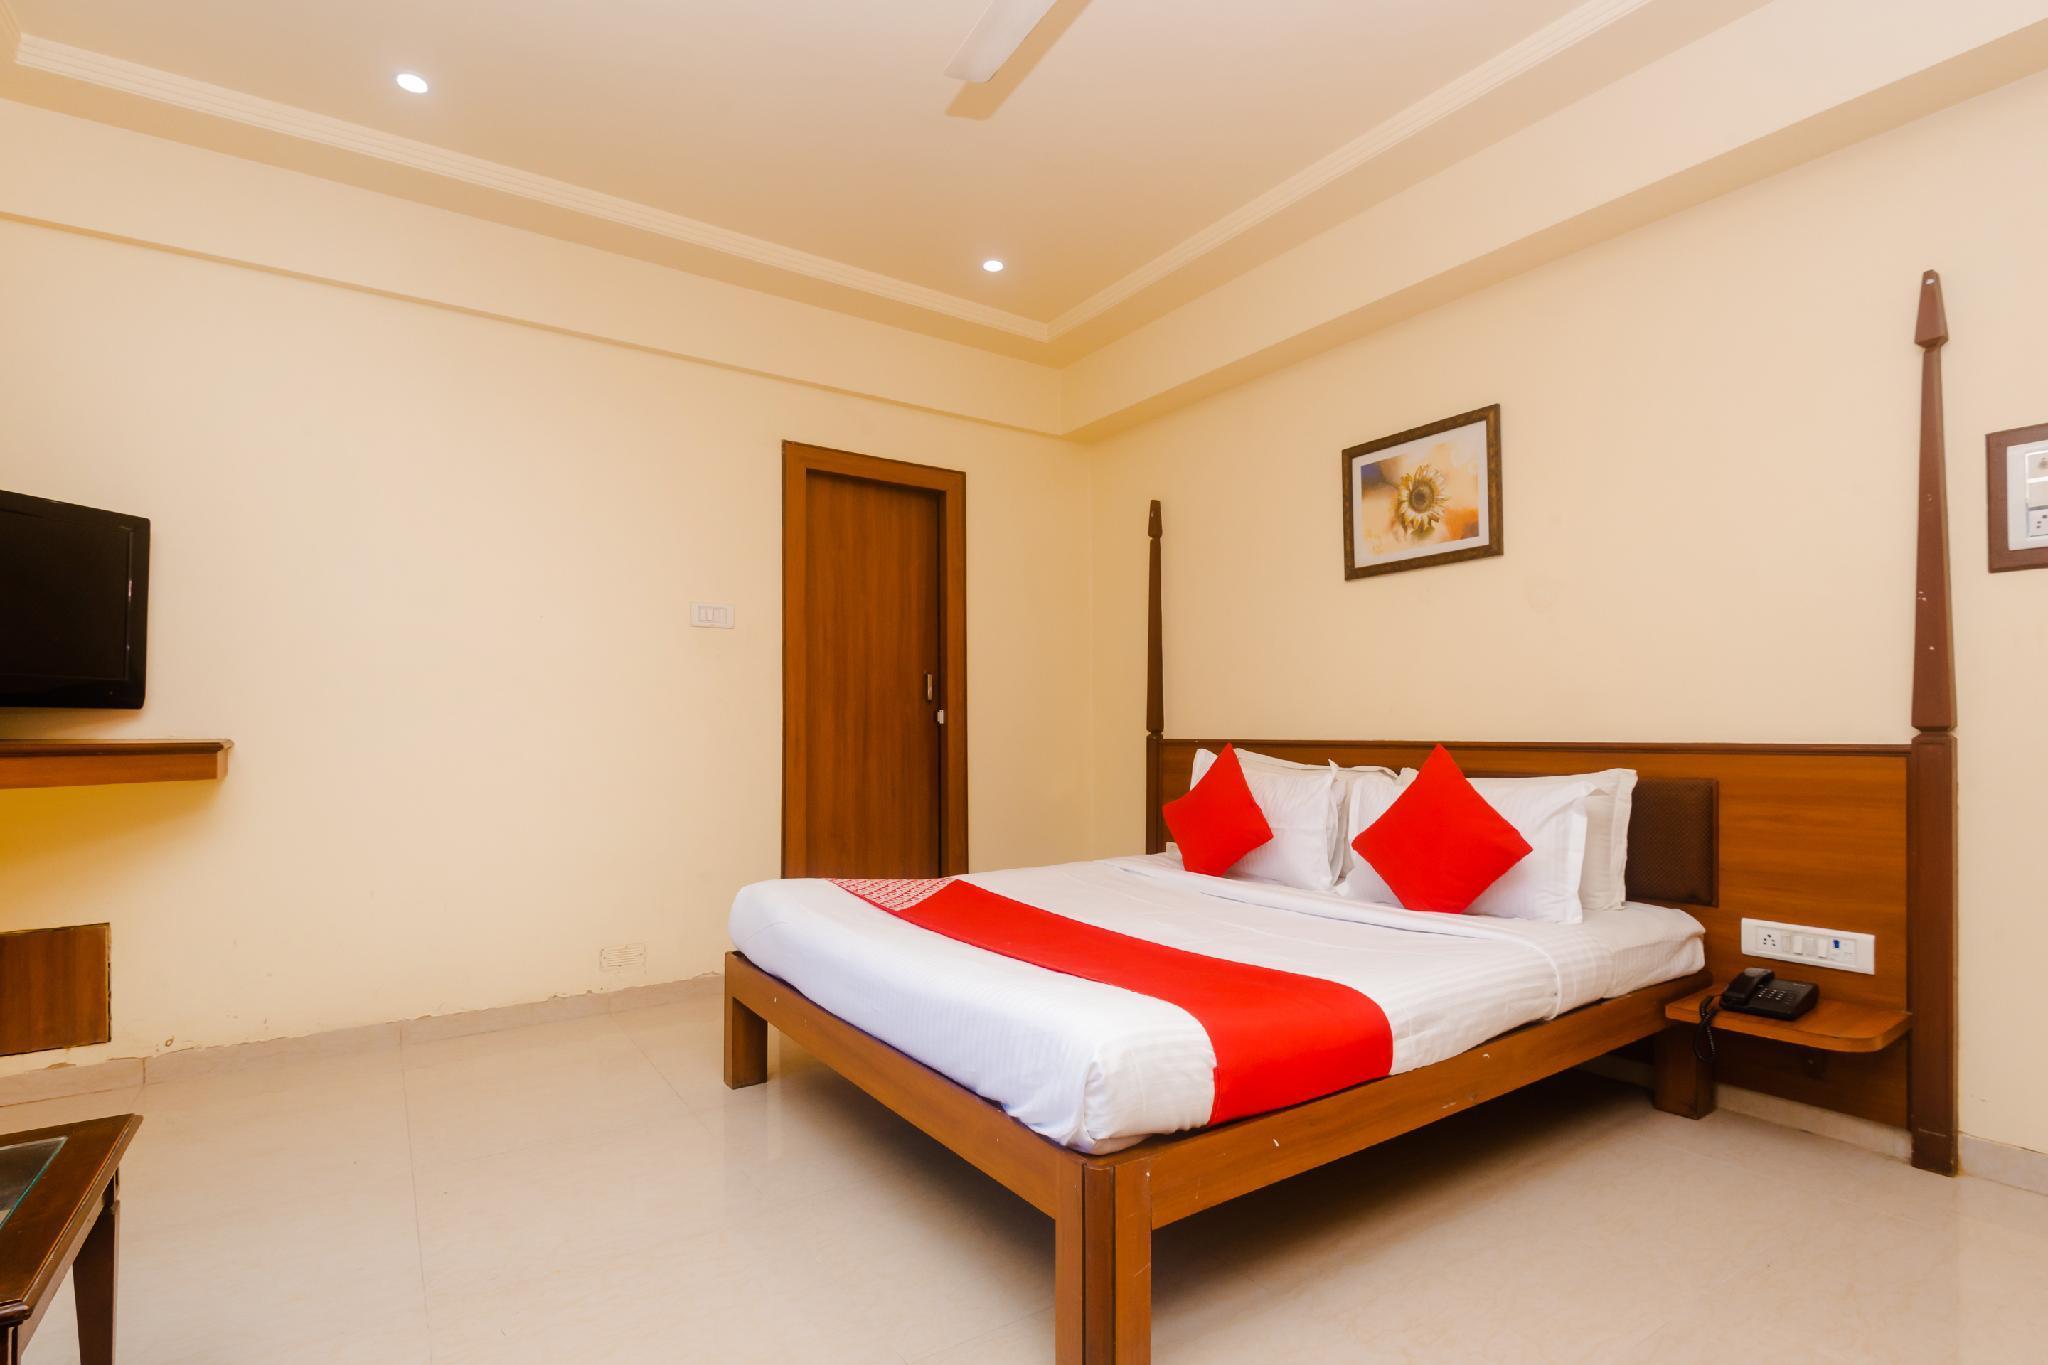 OYO 10382 Hotel Saffron Suites, Palghar